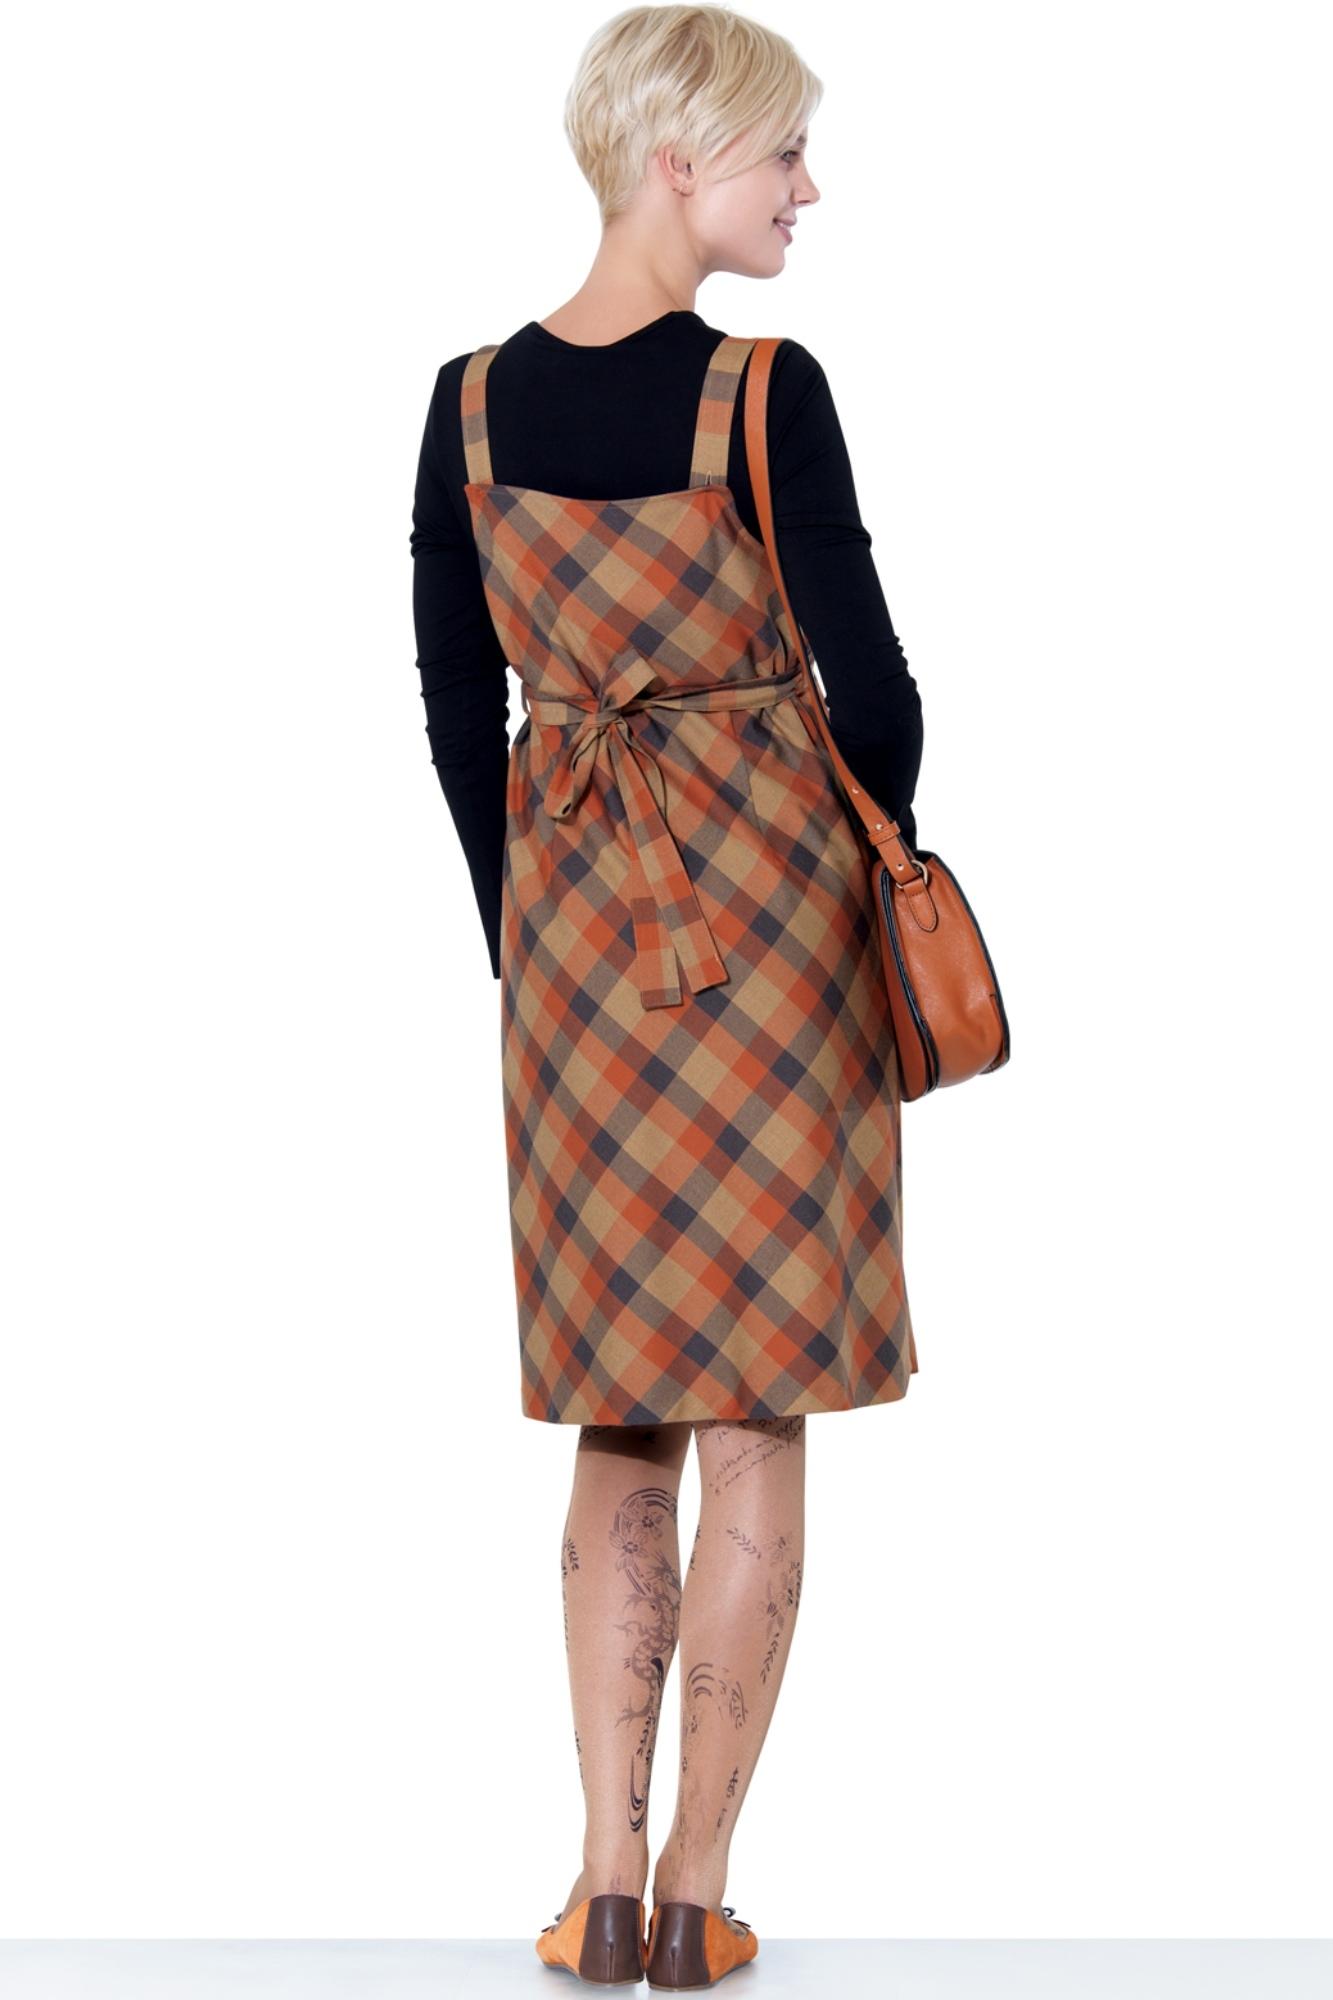 Сарафан 05573 коричневый-оранжевый